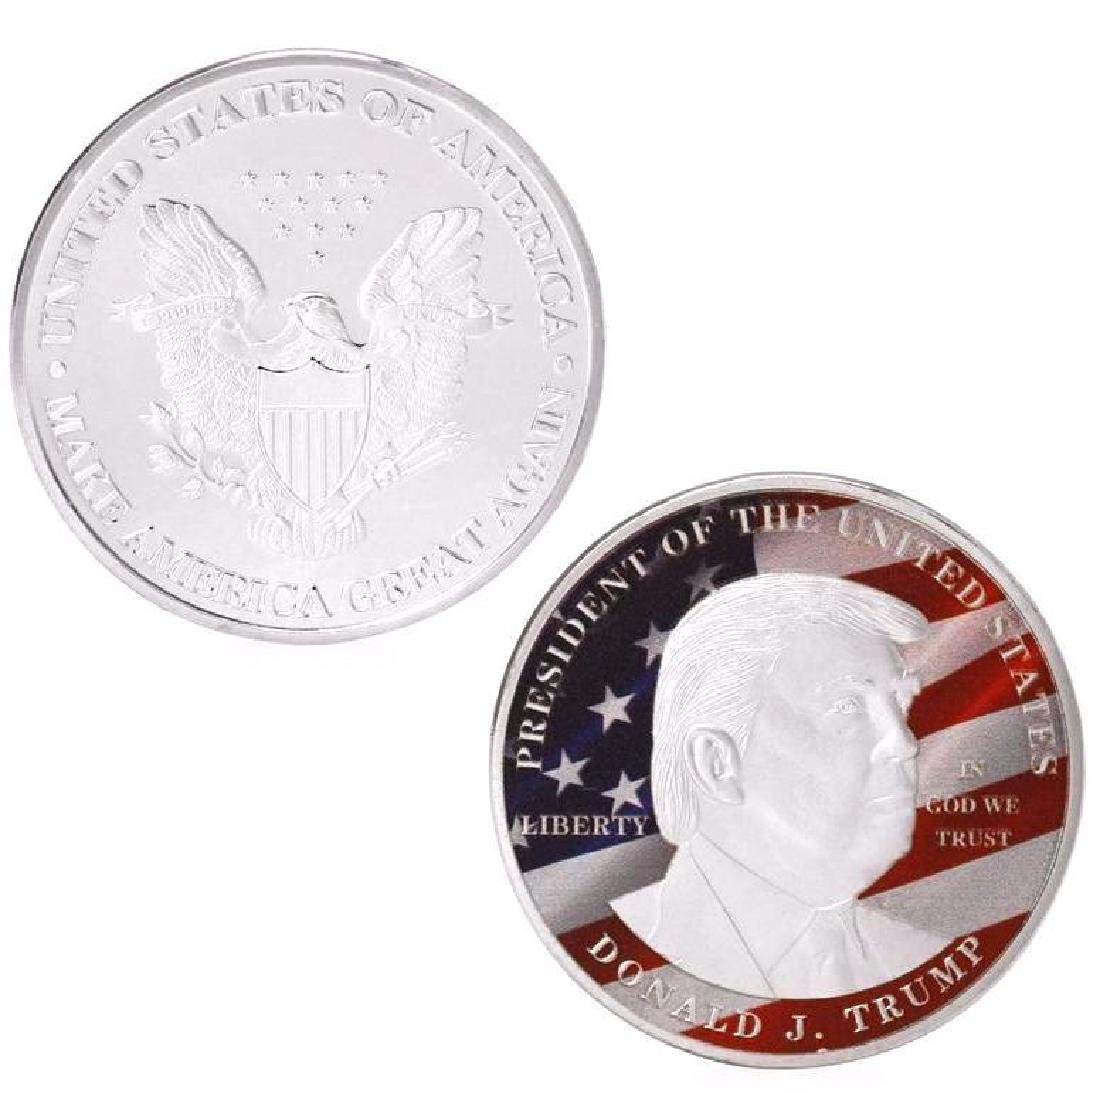 Donald Trump President Colored Silver Clad Coin